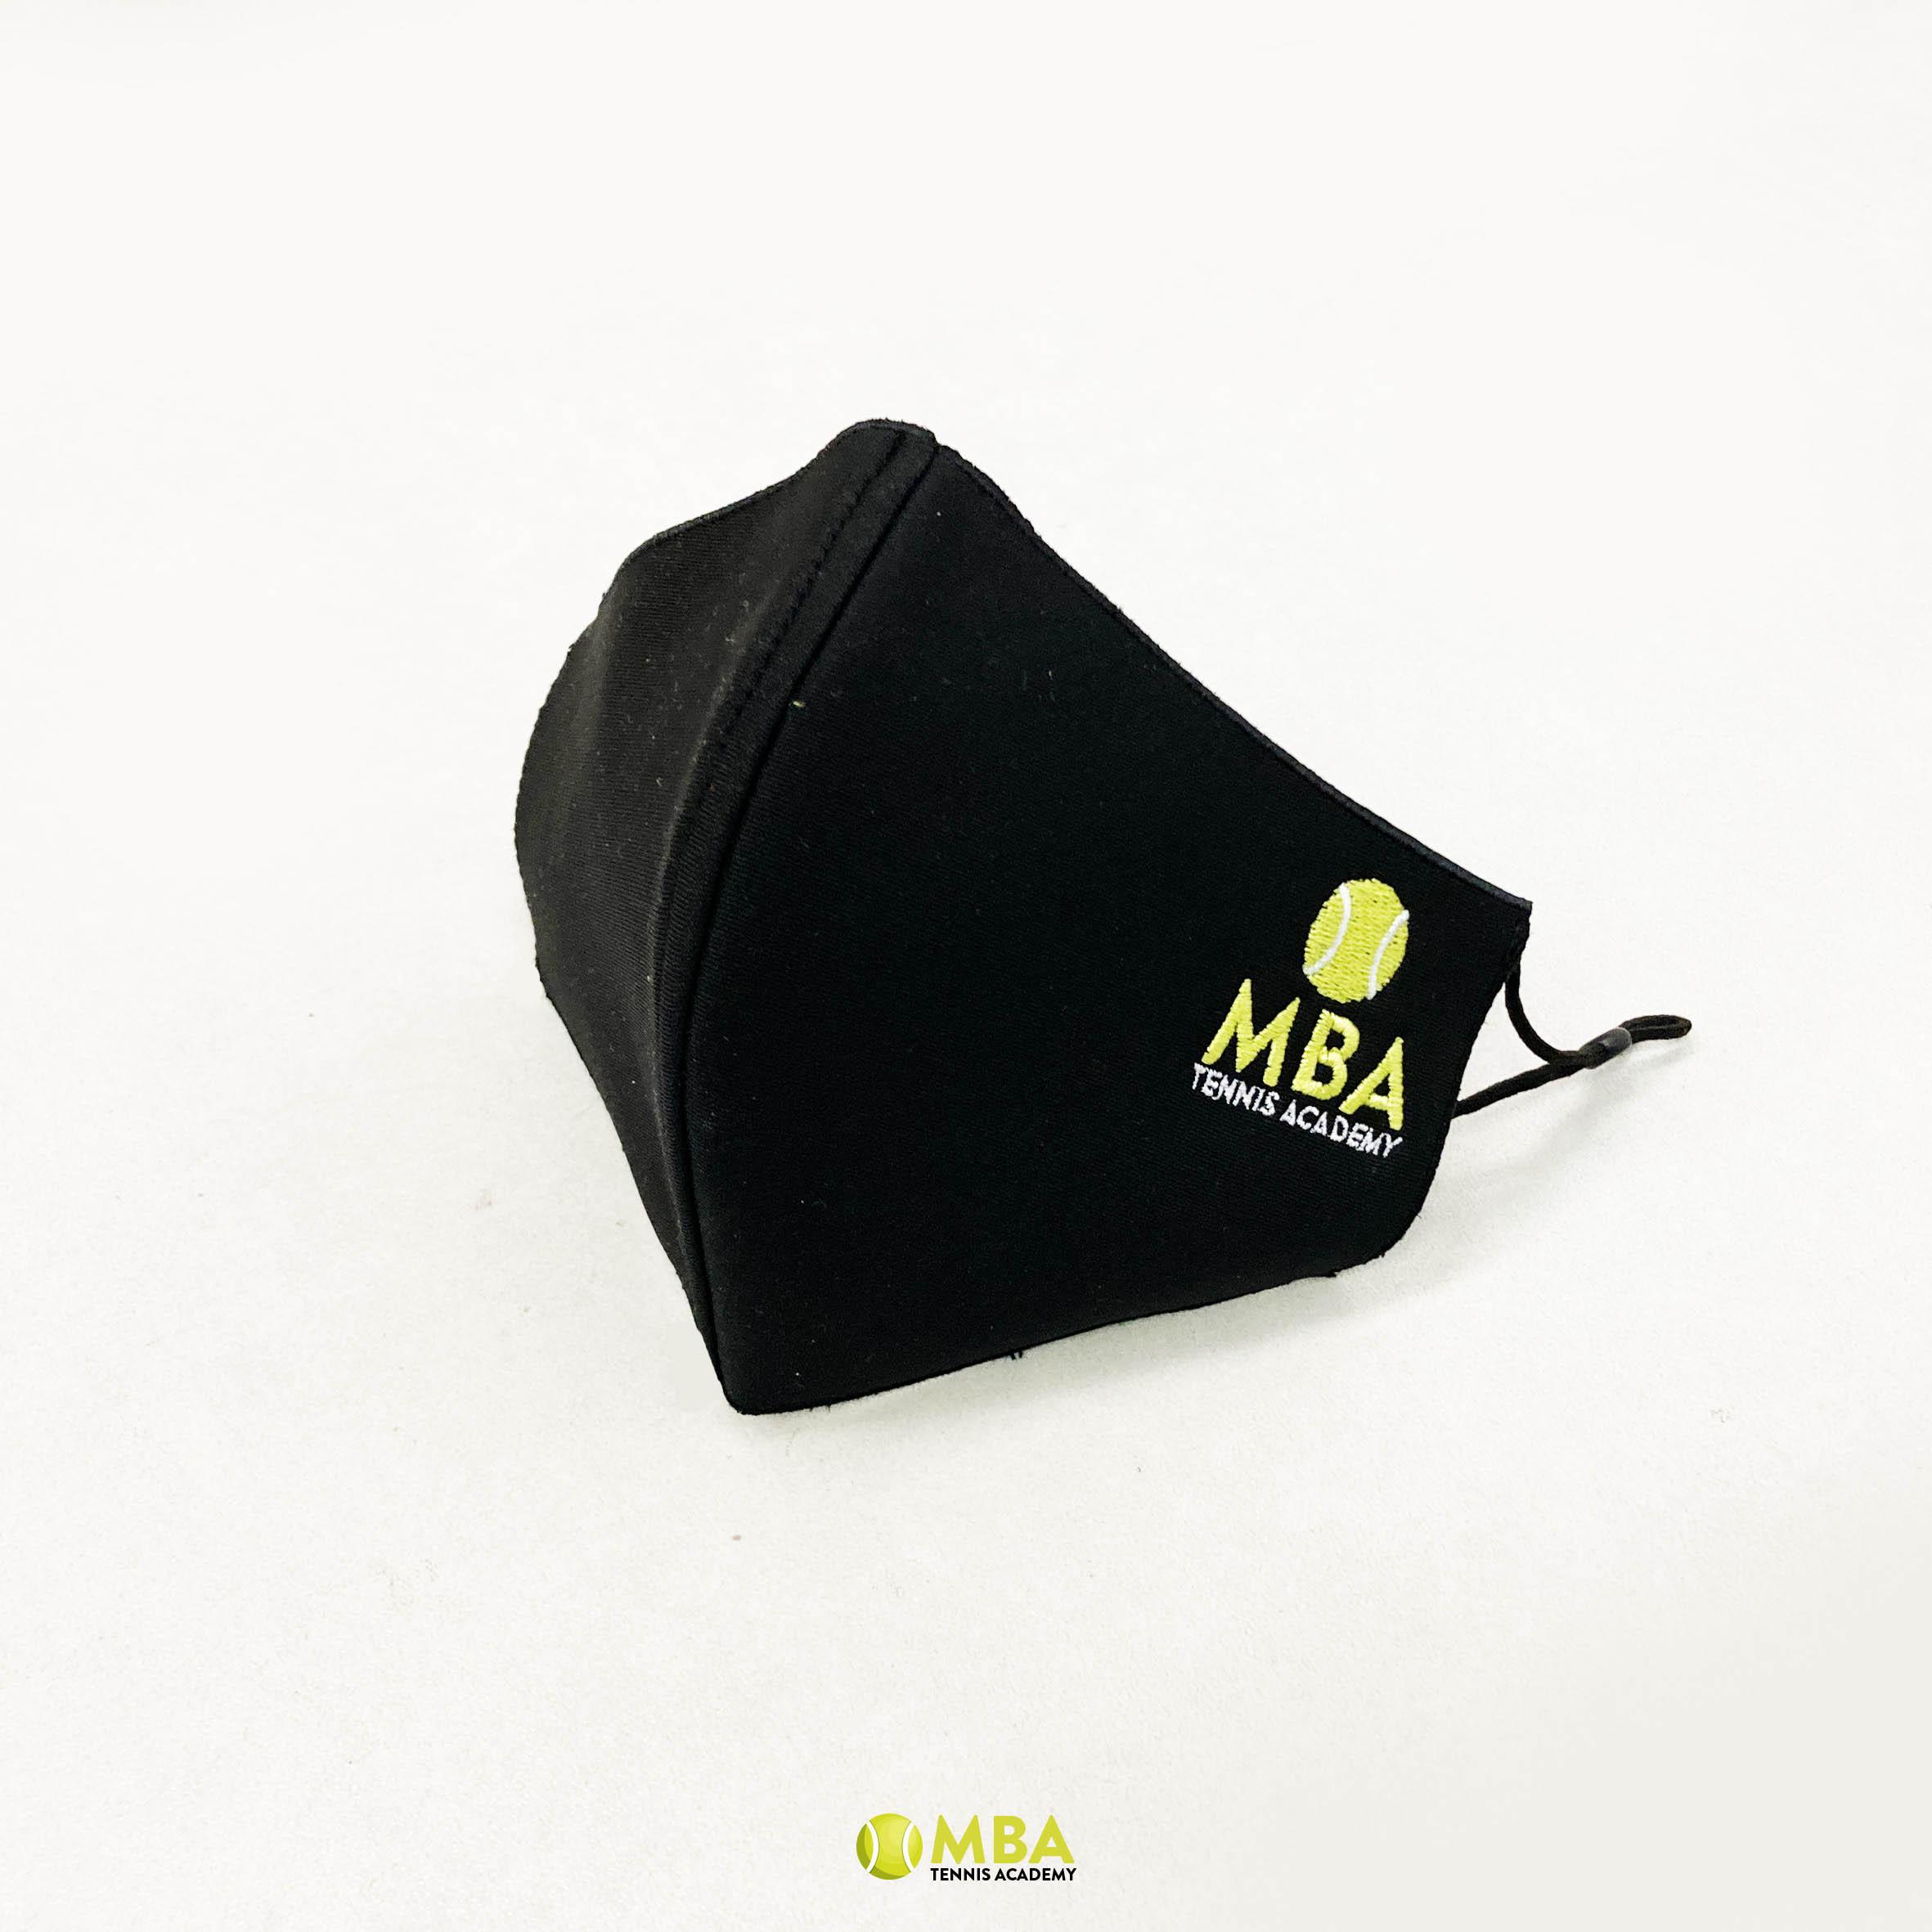 MBA-Tennis-Academy-Mascarilla-1